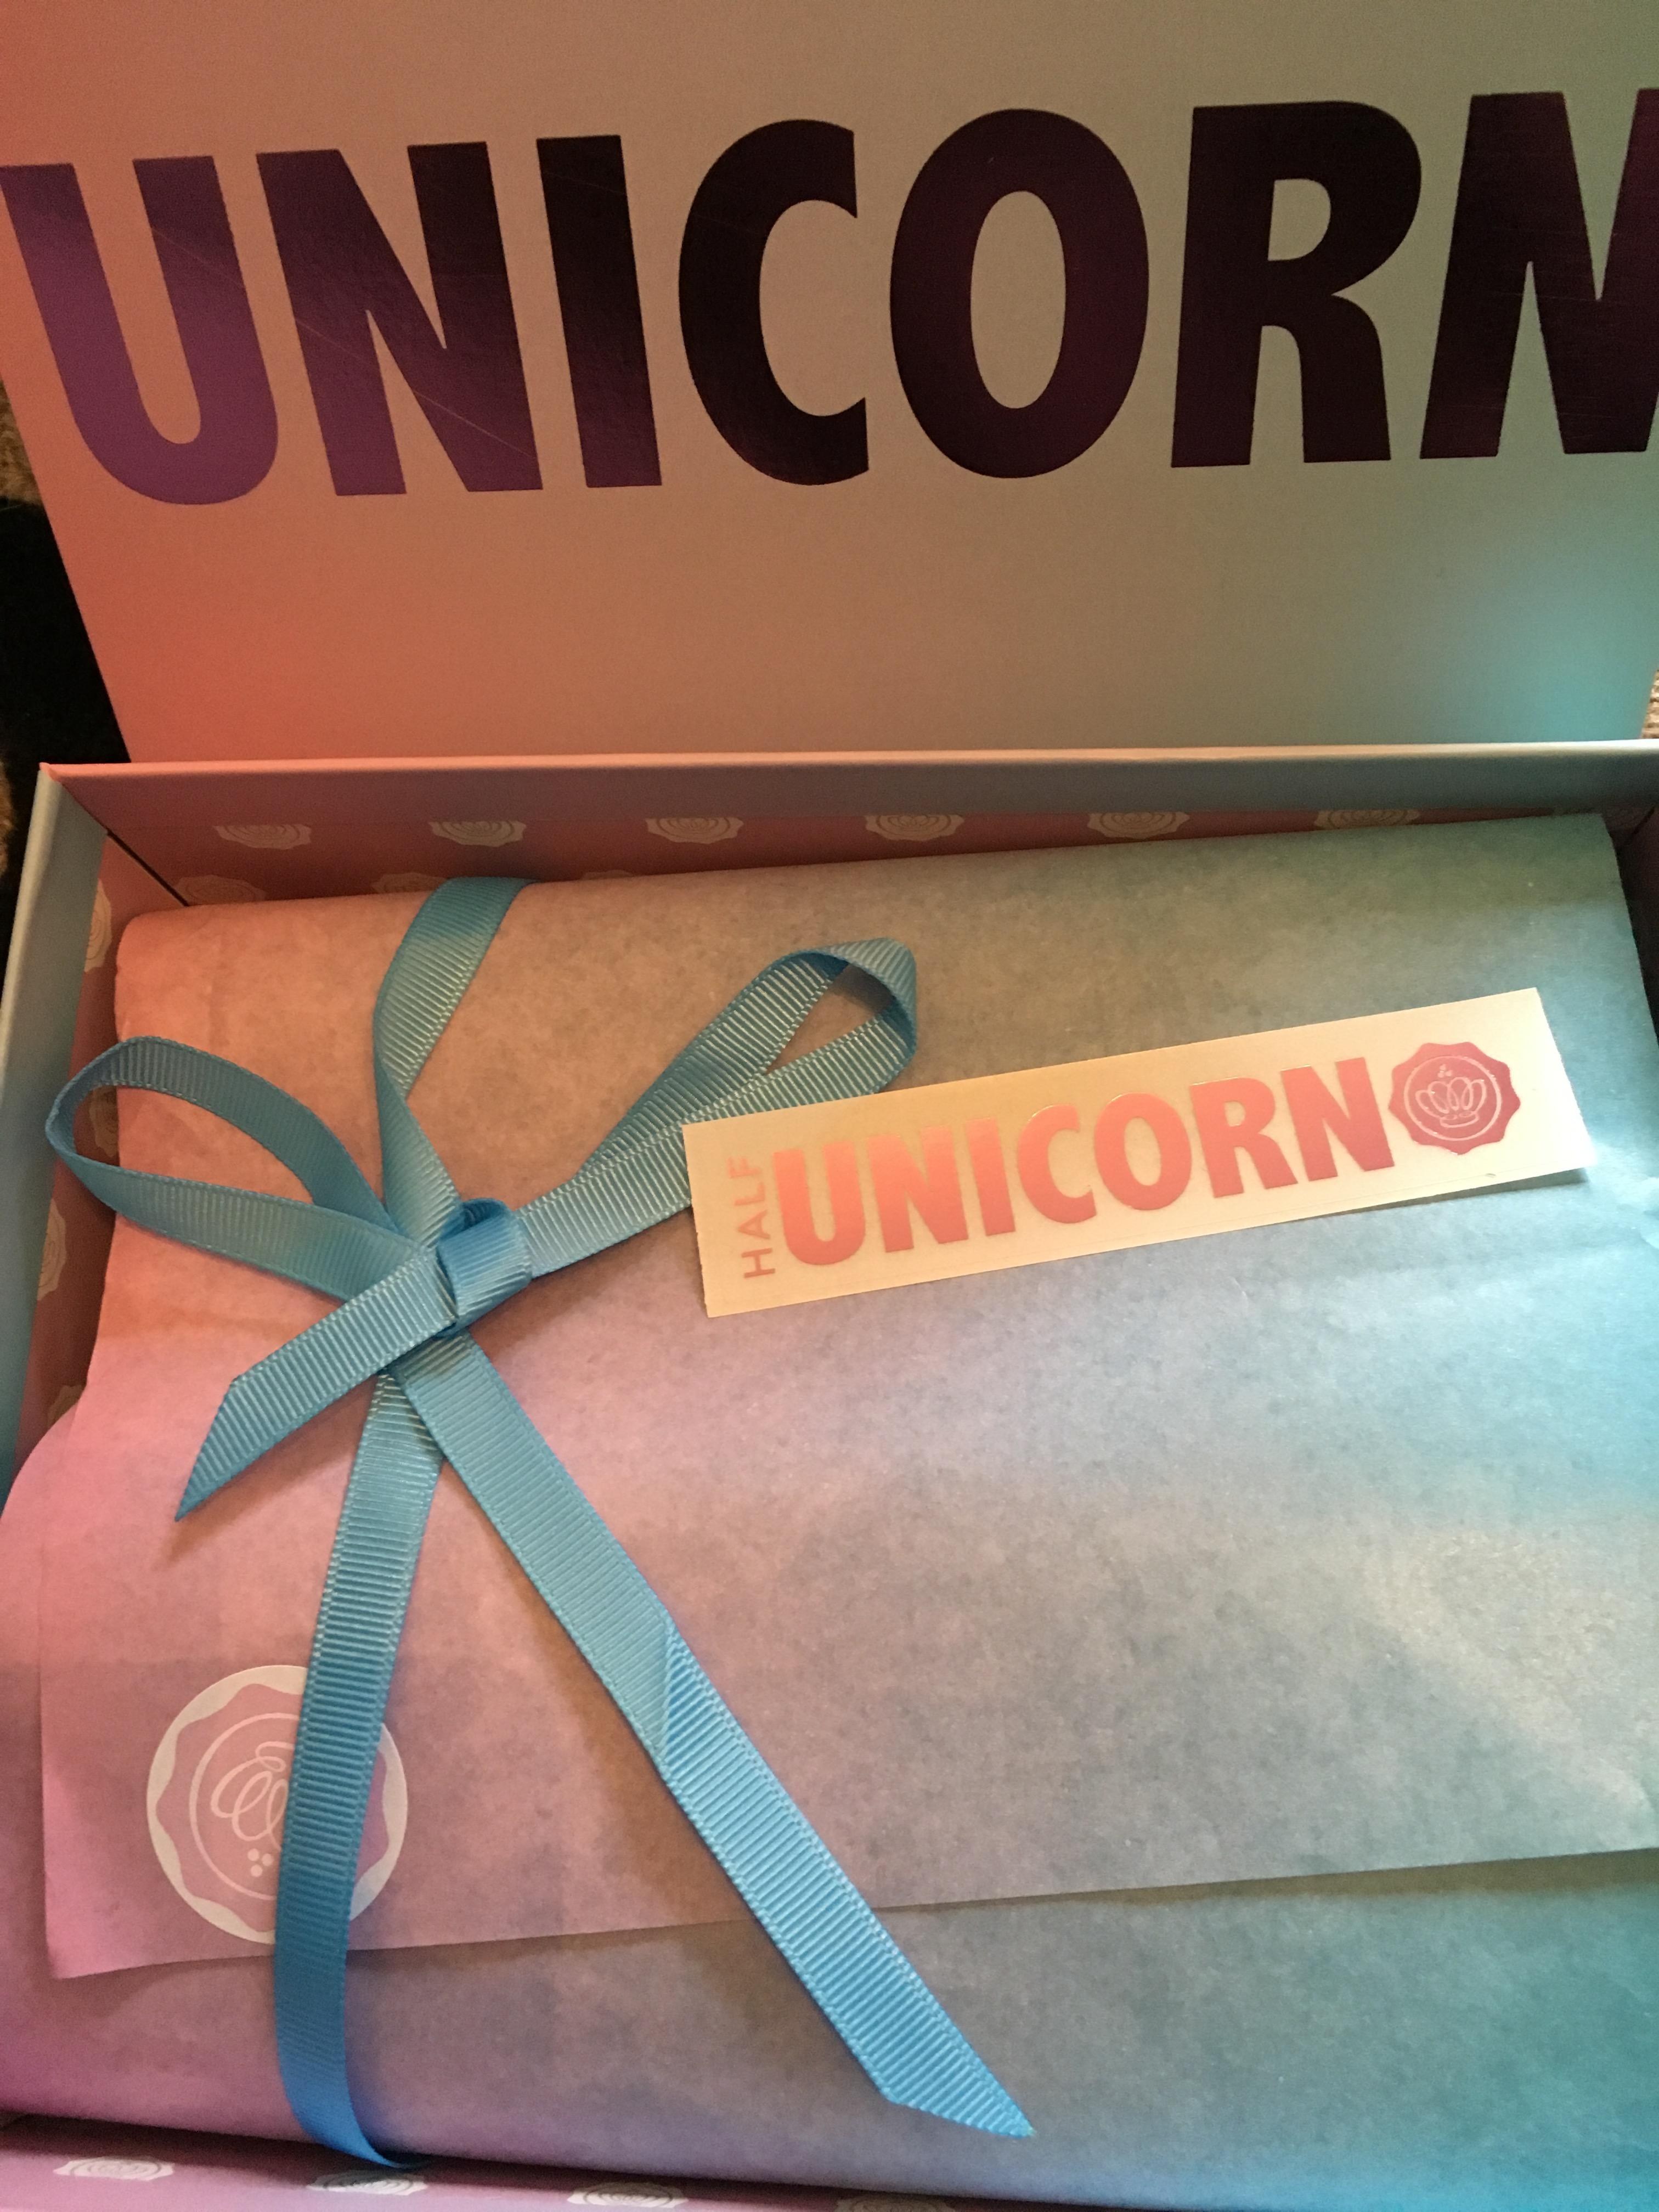 Unboxing October's unicorn Glossybox